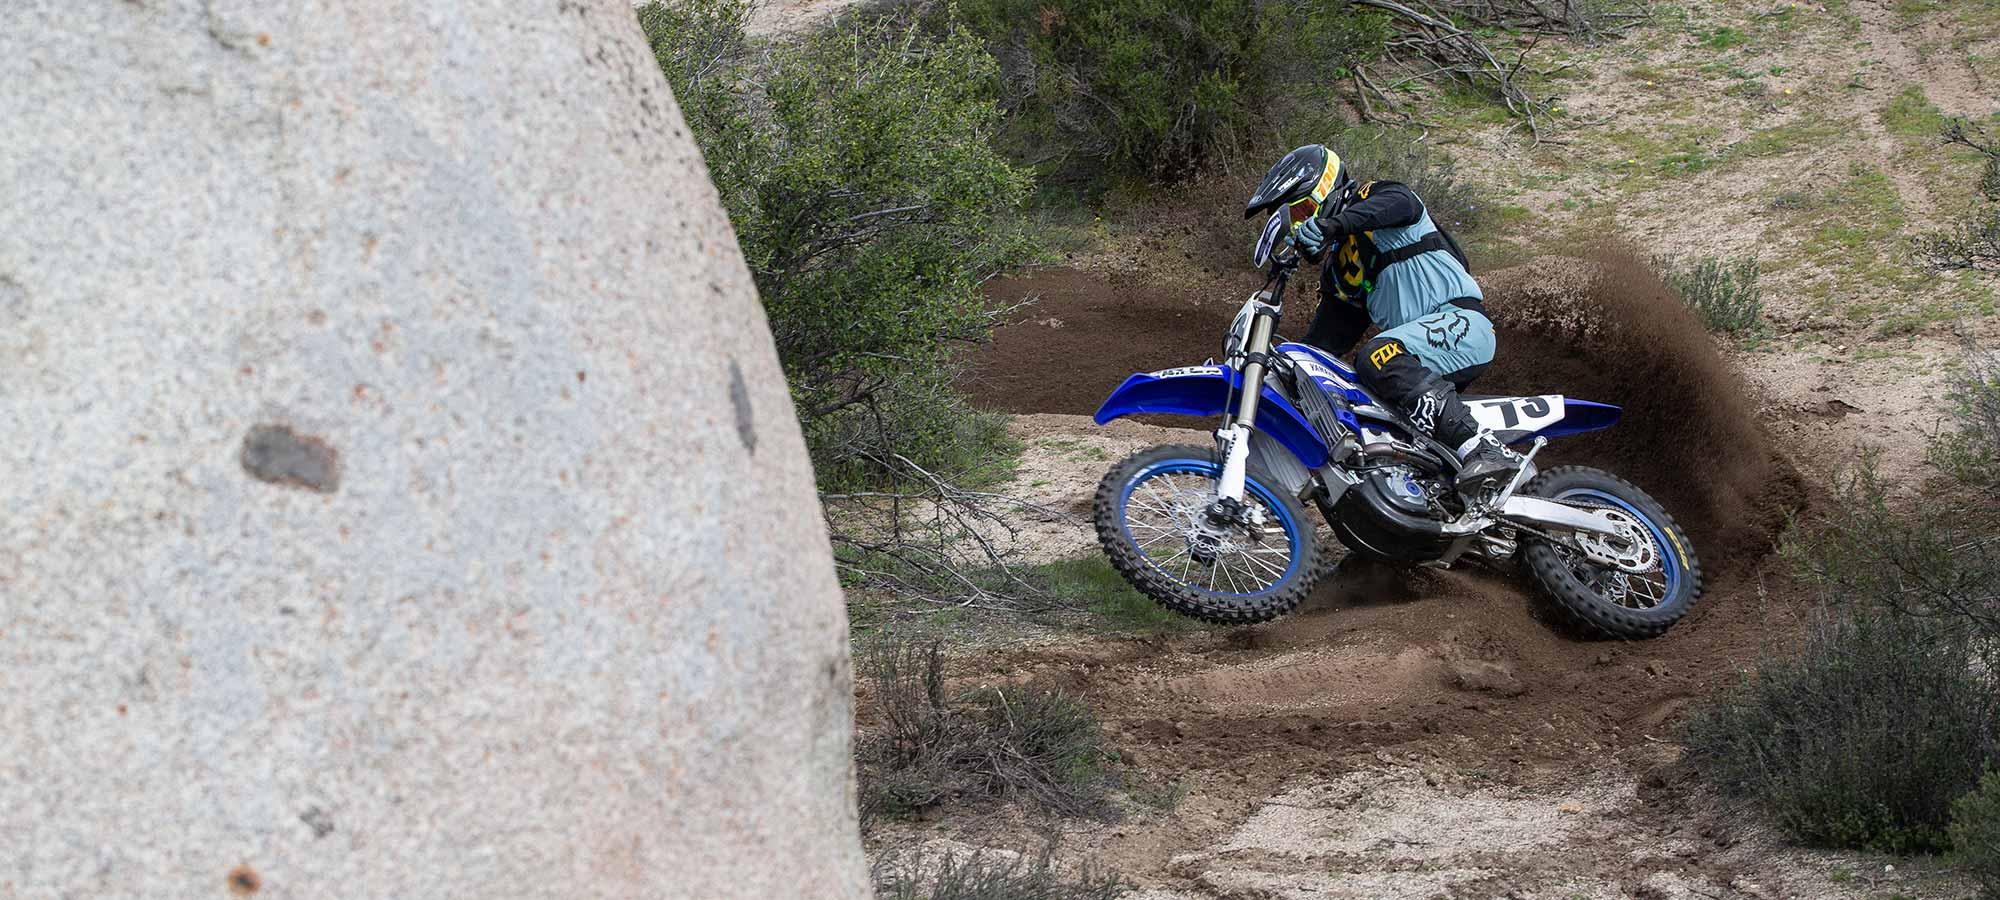 2019 Yamaha YZ450FX with biker riding it.